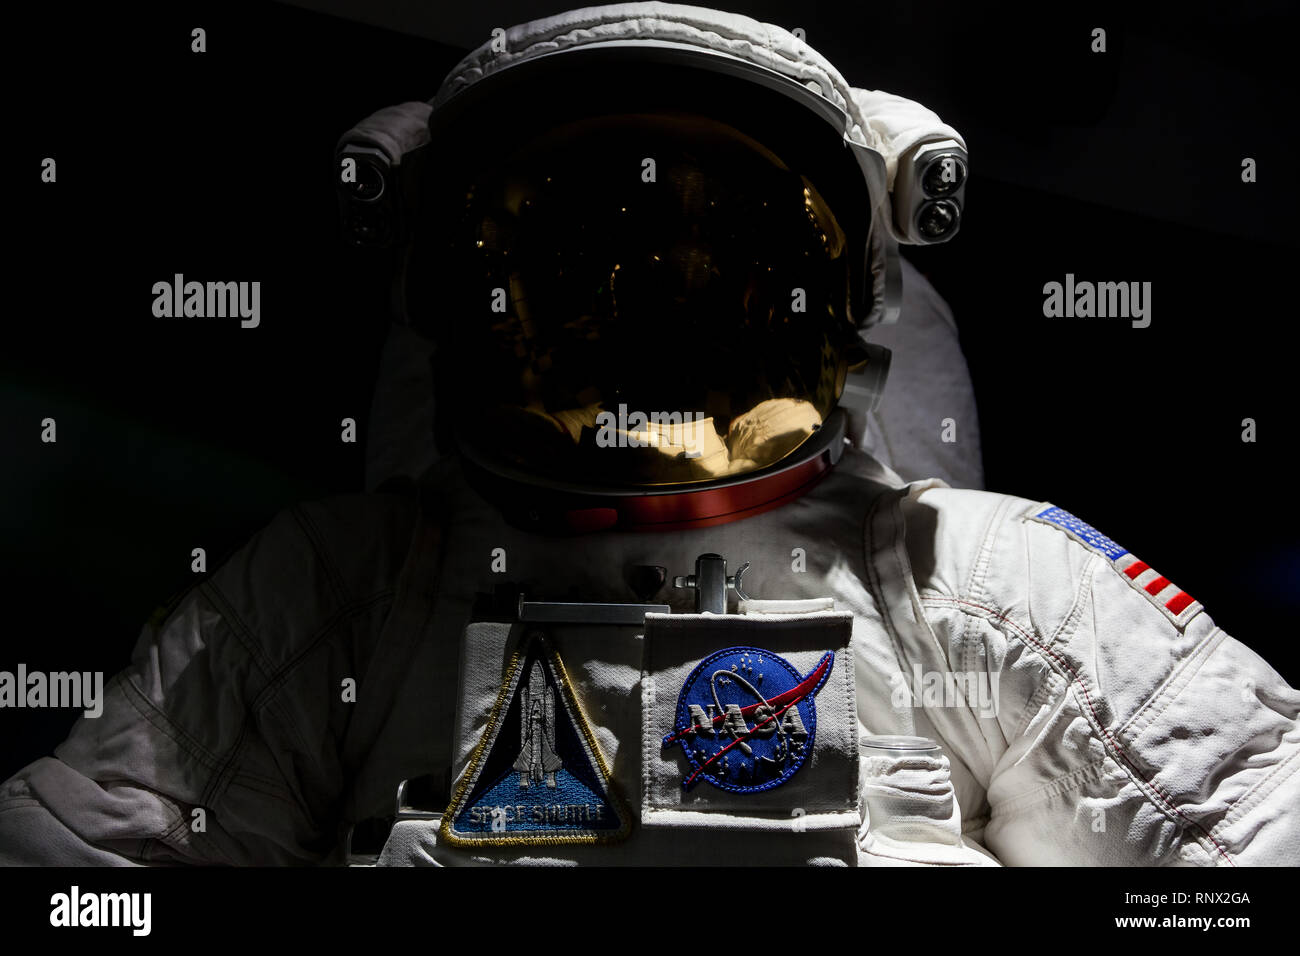 NASA astronaut suit on display in the Minolta Gallery, Shinjuku, Tokyo, Japan Friday January 31st 2014 - Stock Image